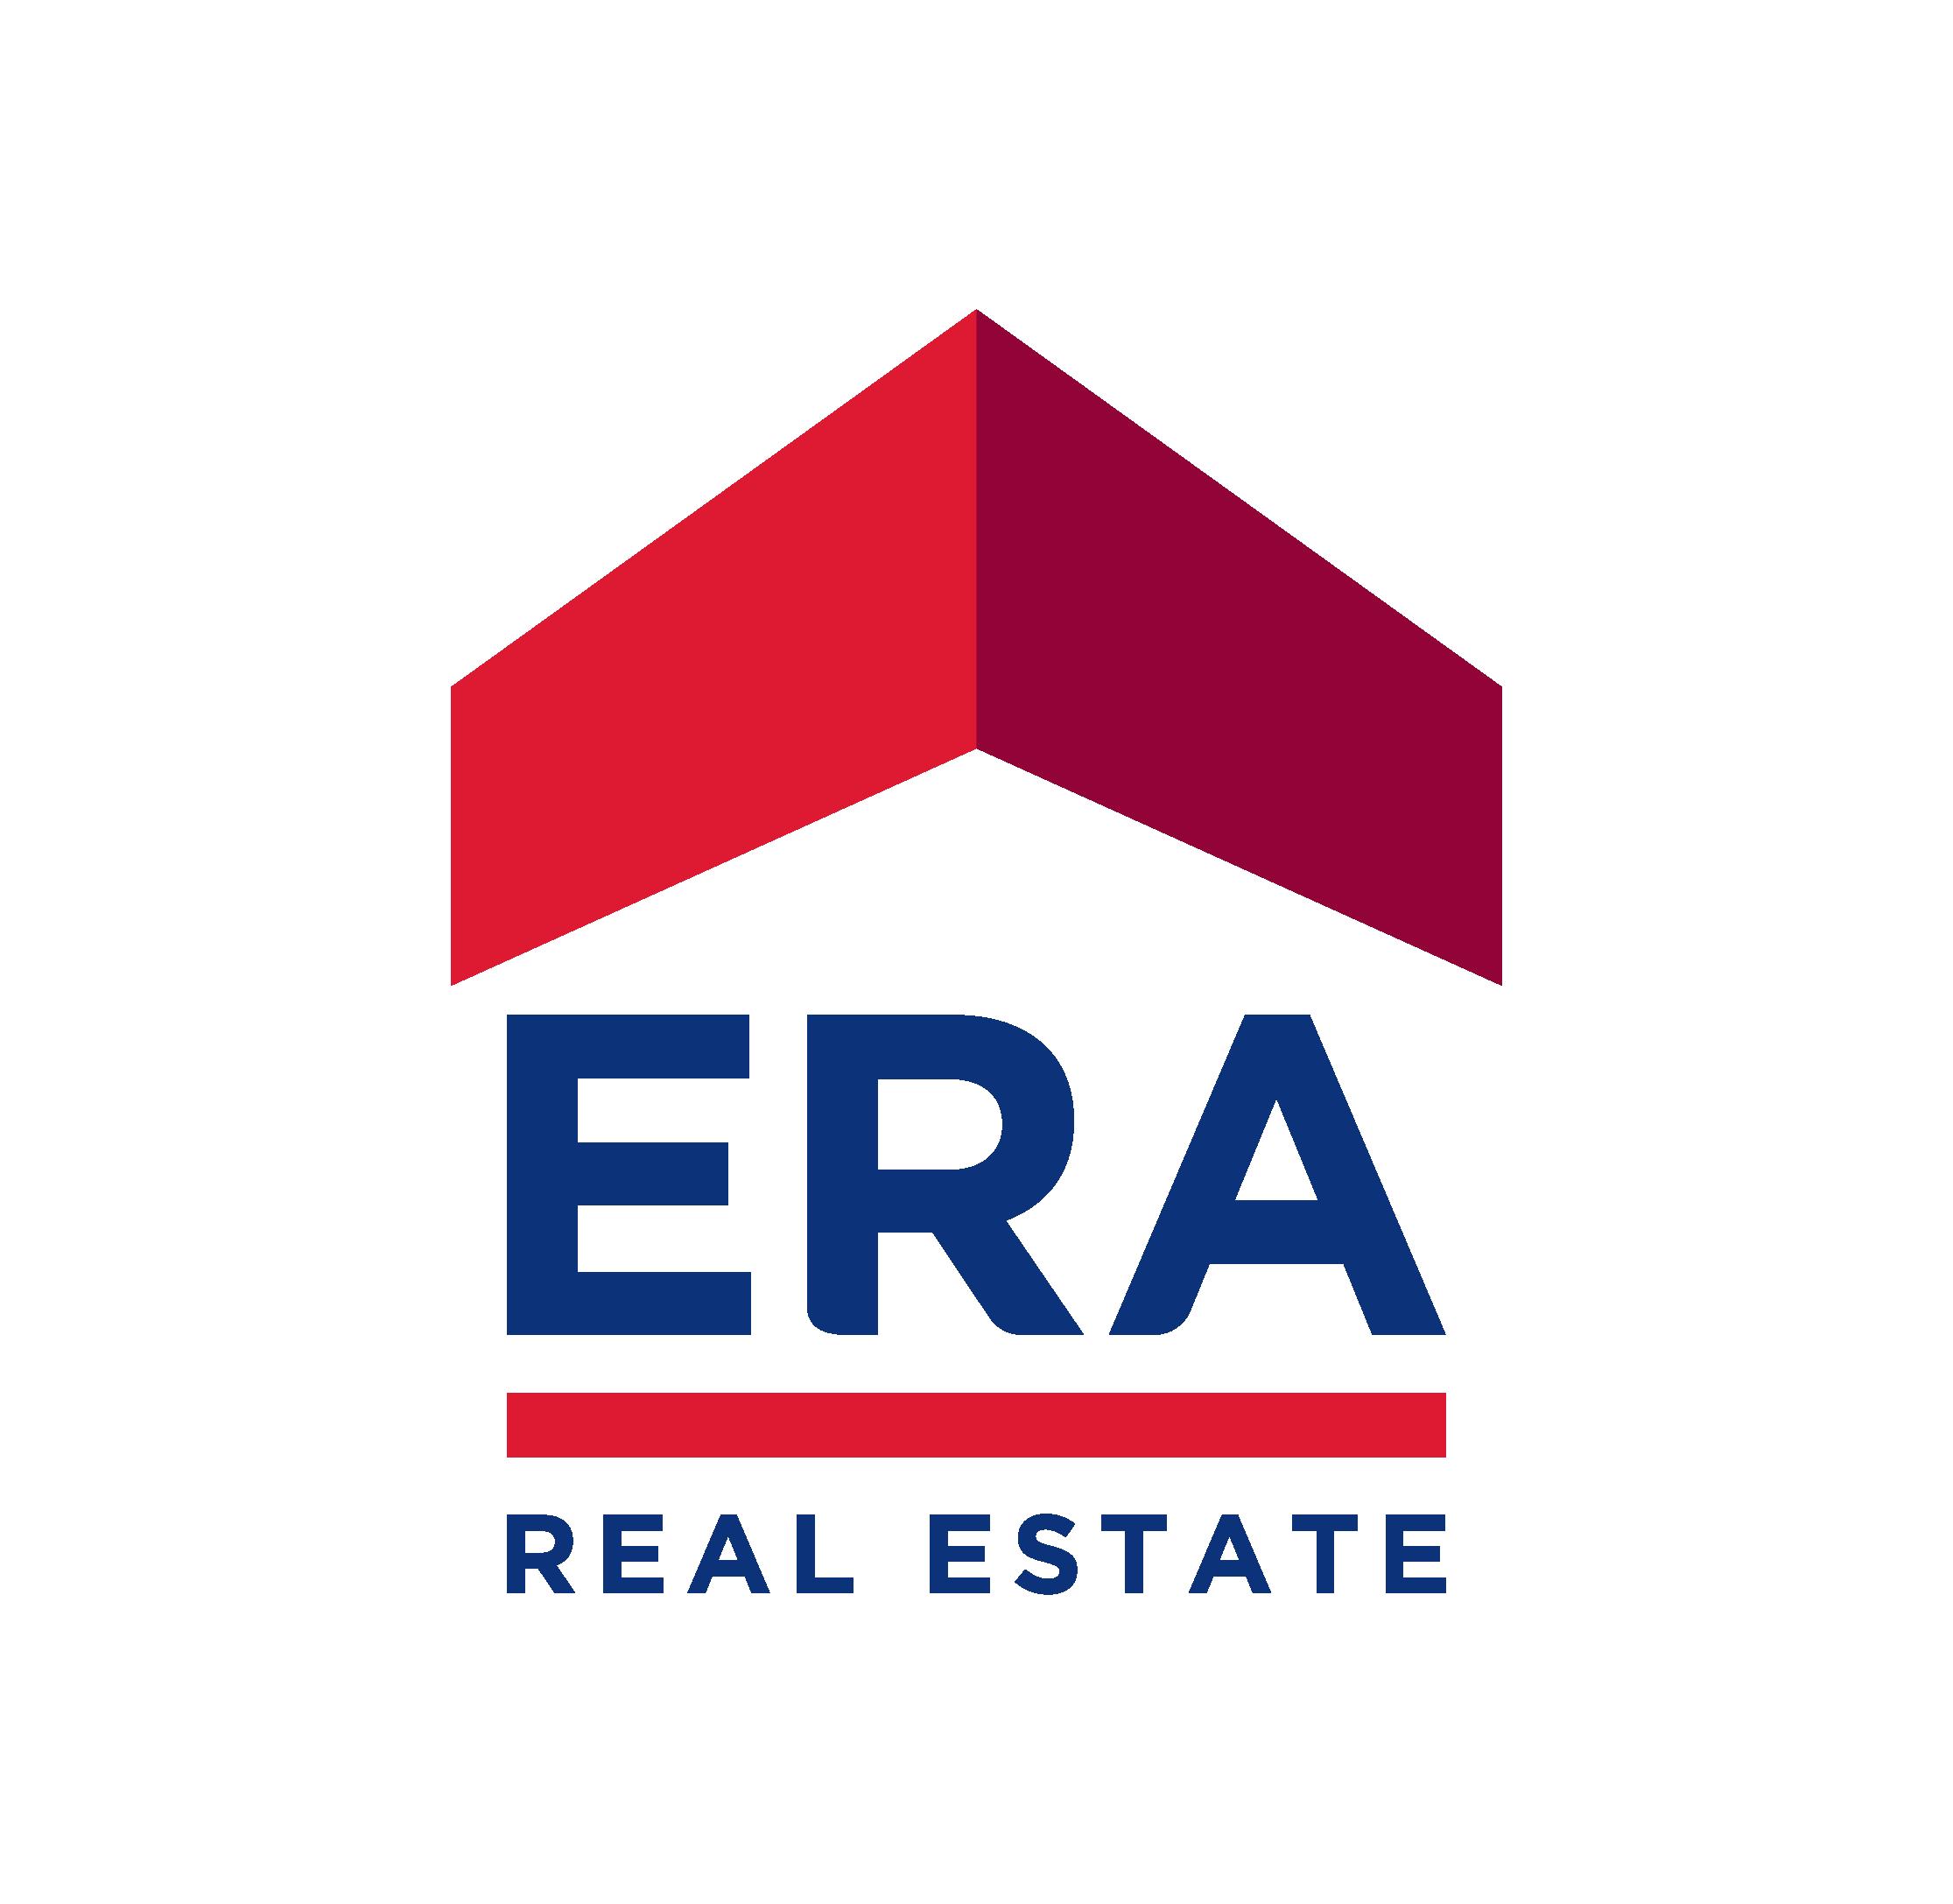 ERA Real Estate, Singapore Condo For Sale & Rent